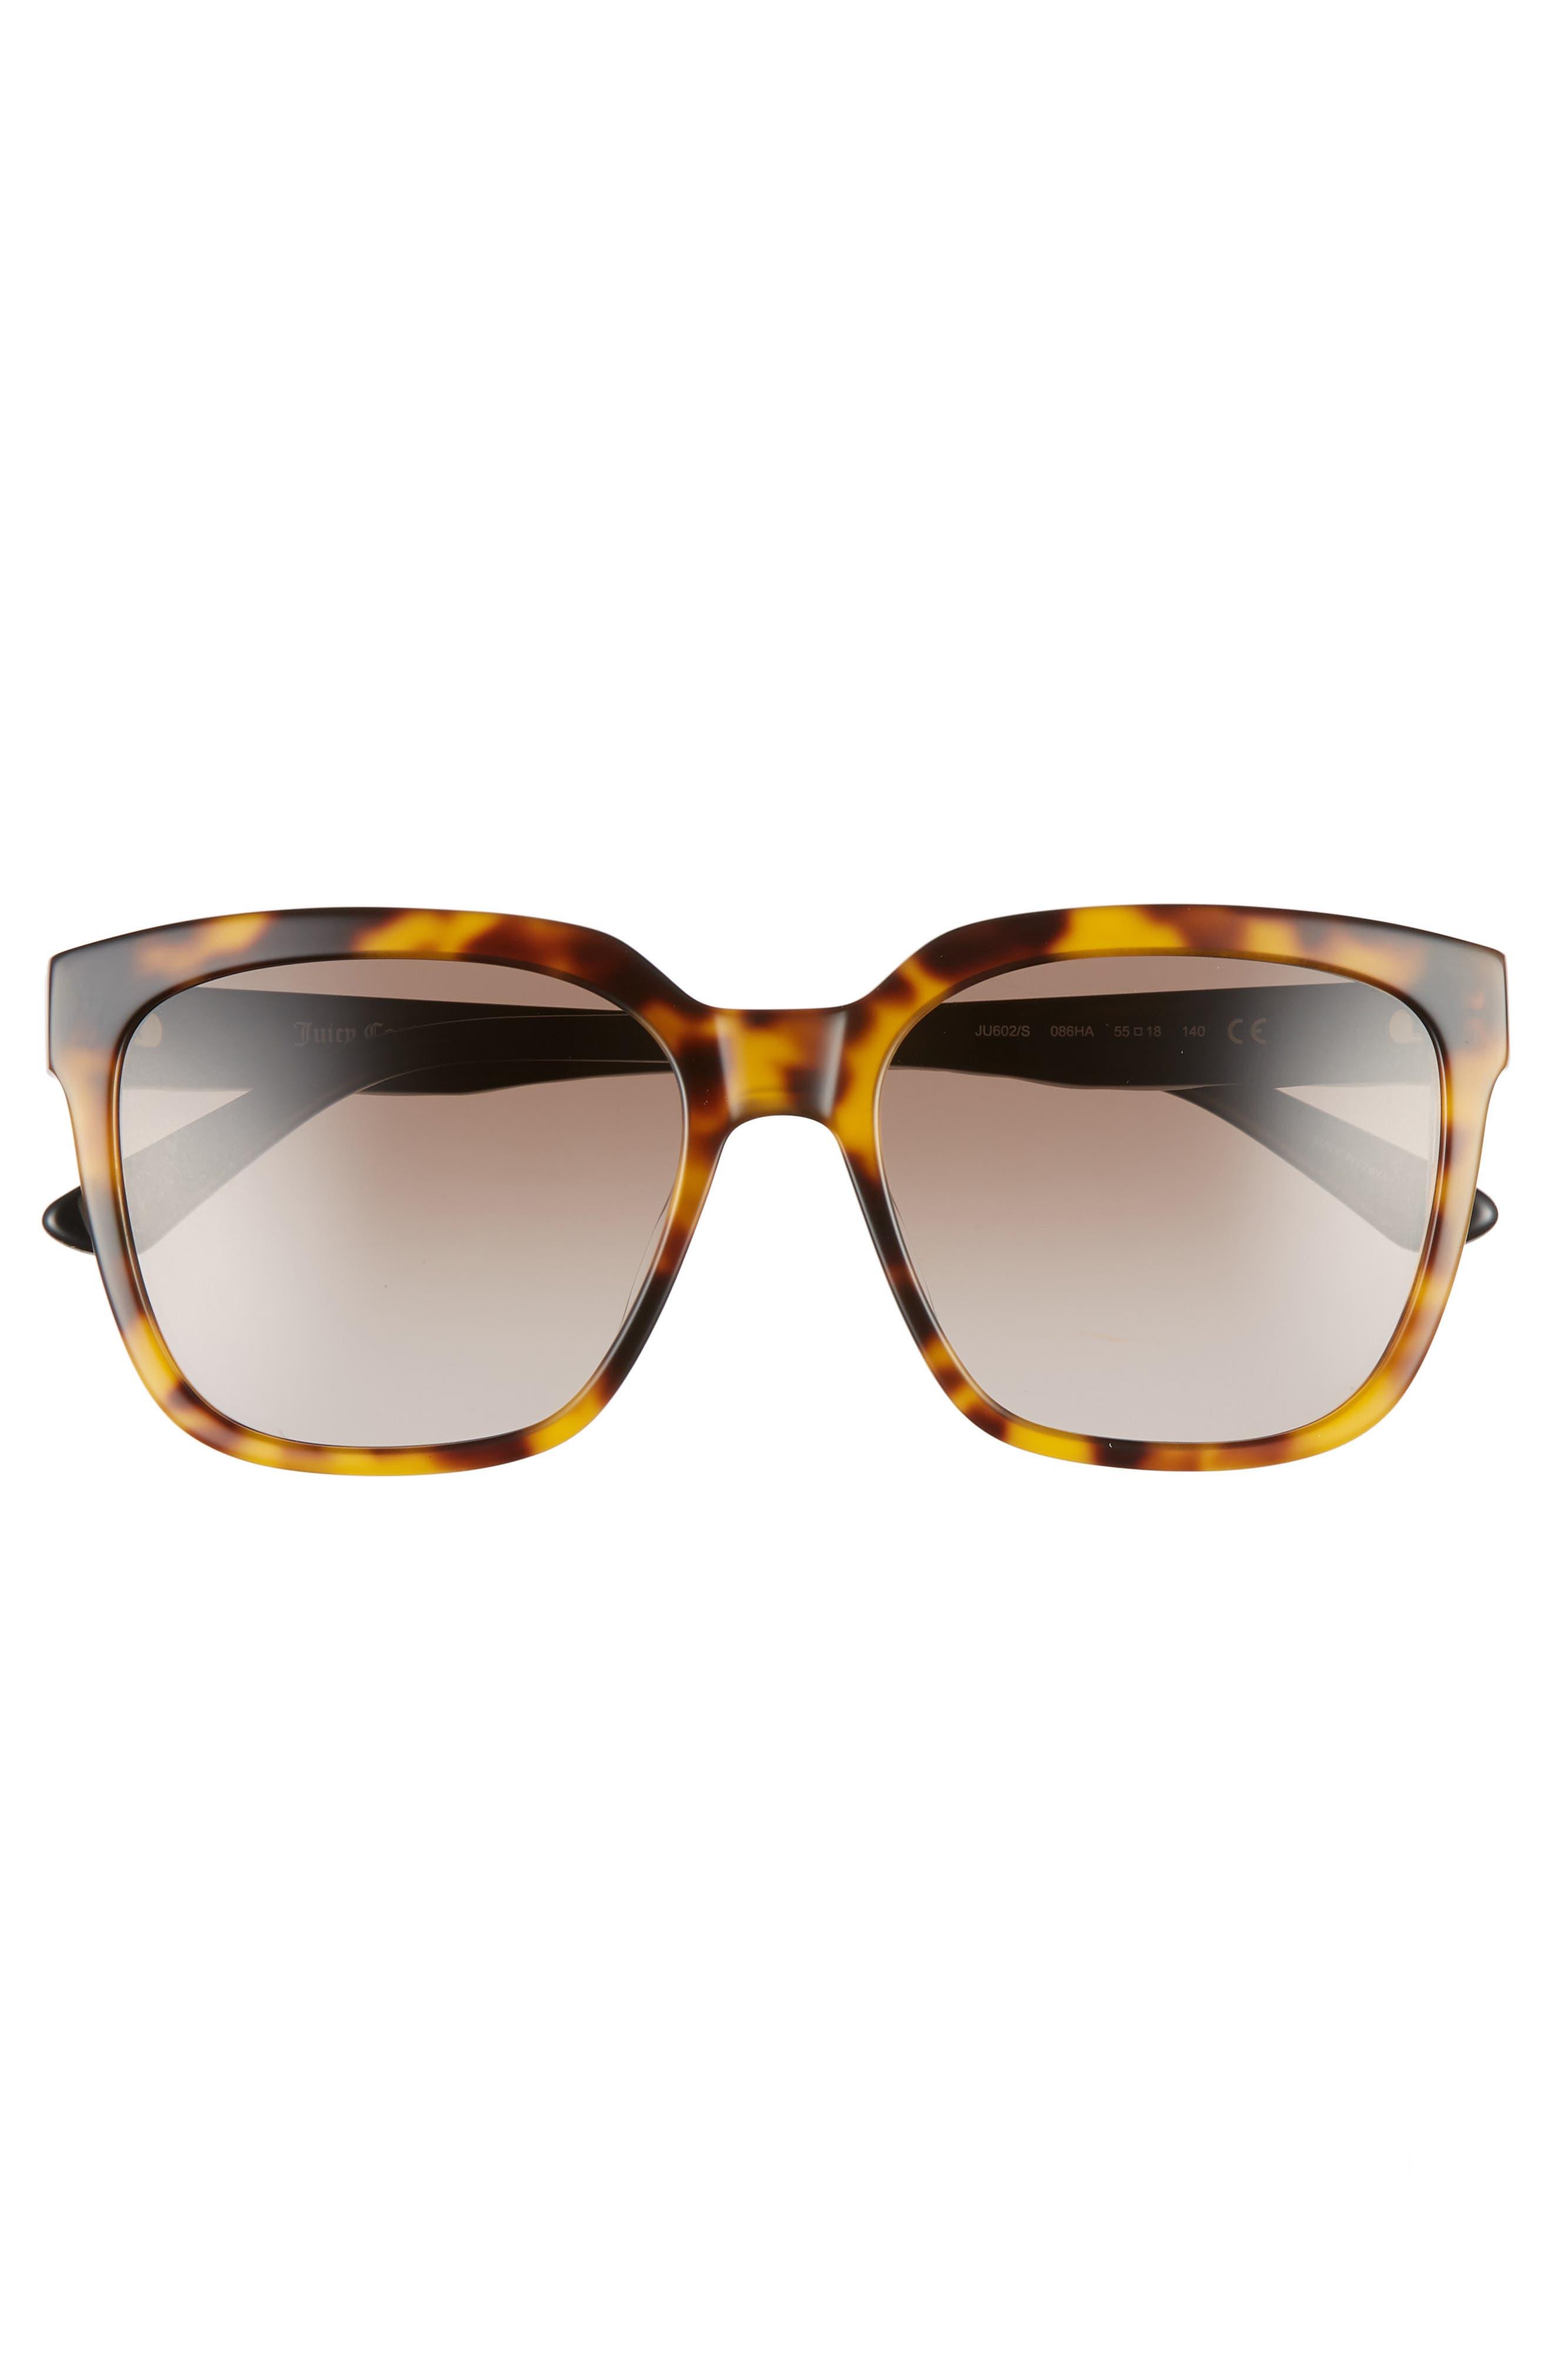 JUICY COUTURE, Core 55mm Square Sunglasses, Alternate thumbnail 3, color, BLACK